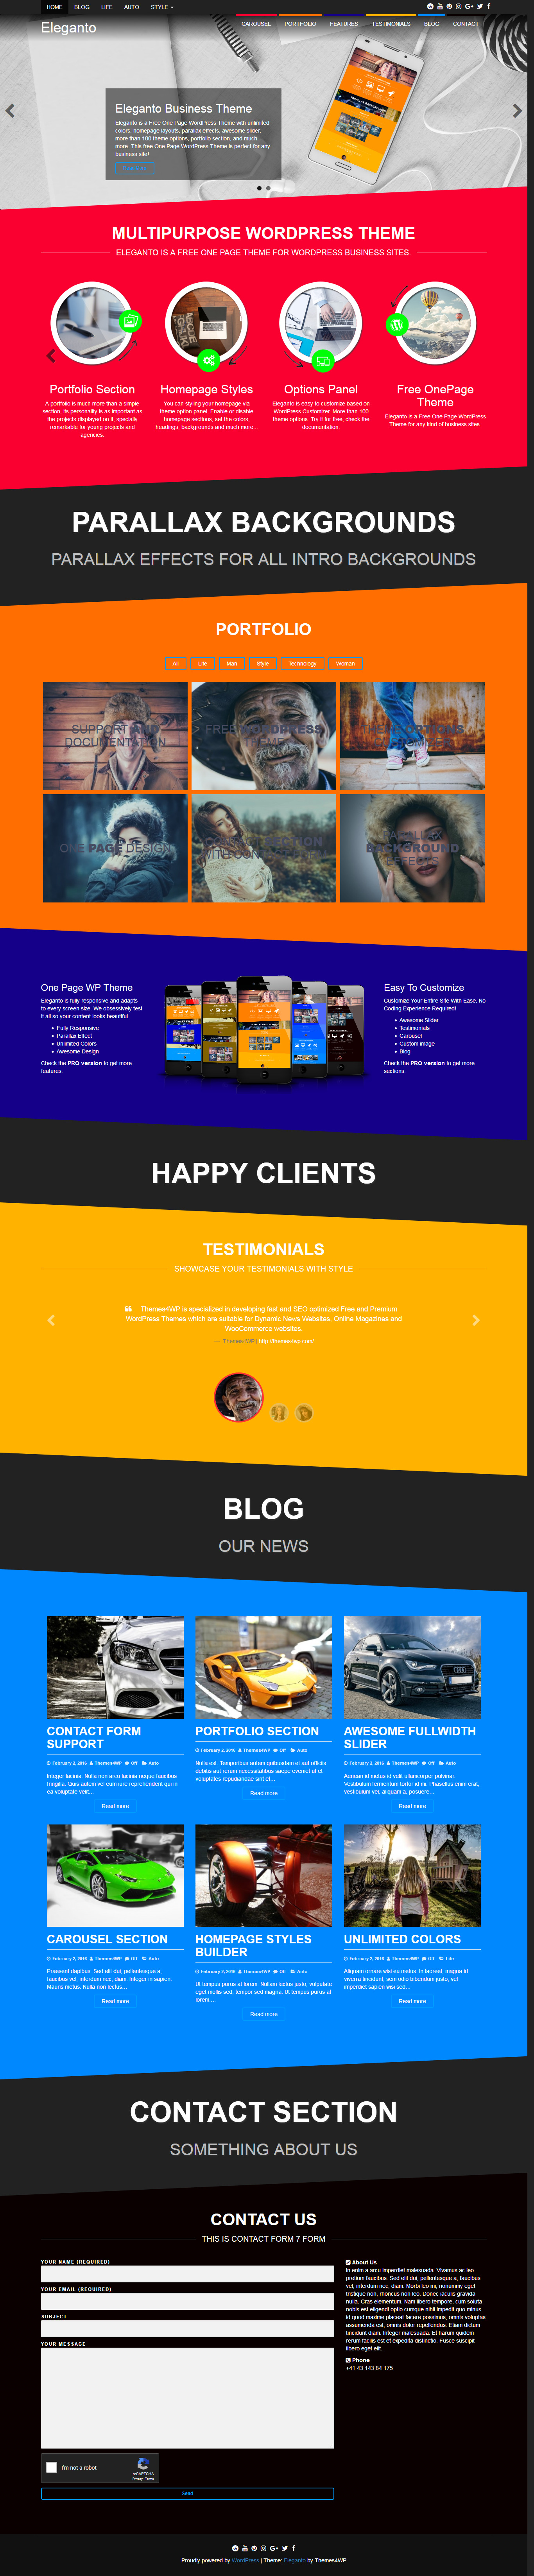 Eleganto - Best Free Event WordPress Theme